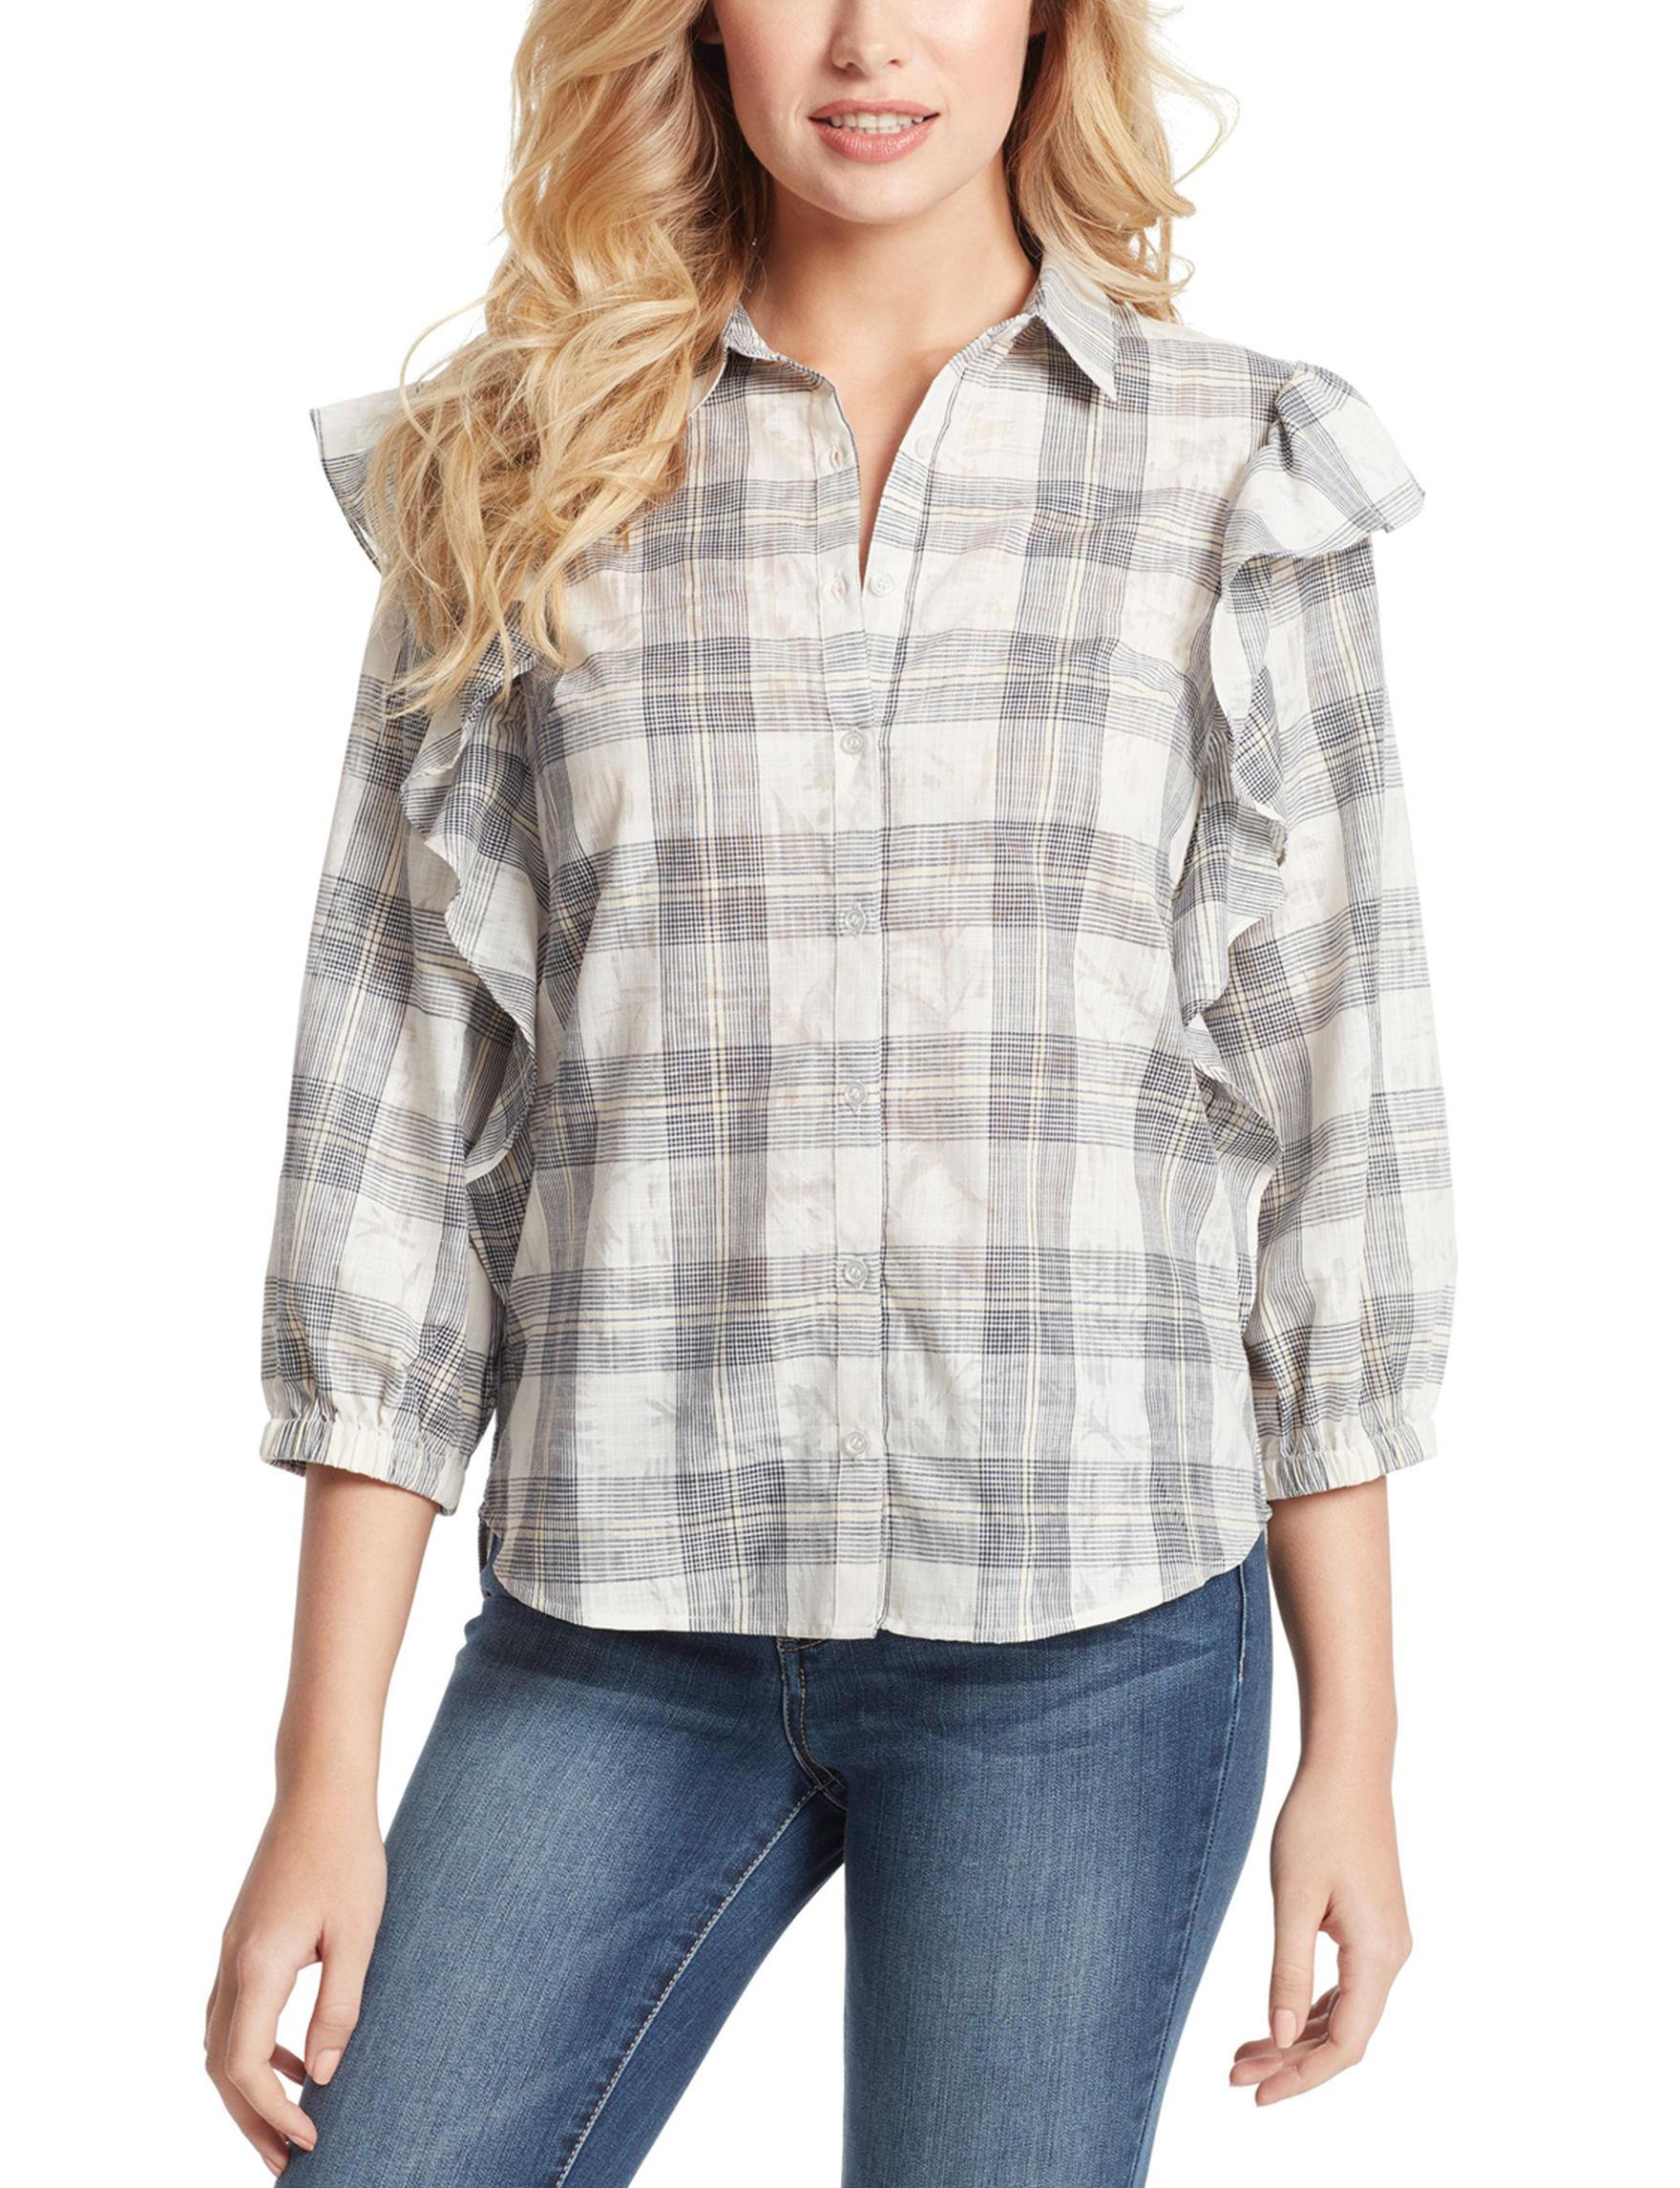 Jessica Simpson Beige Plaid Shirts & Blouses